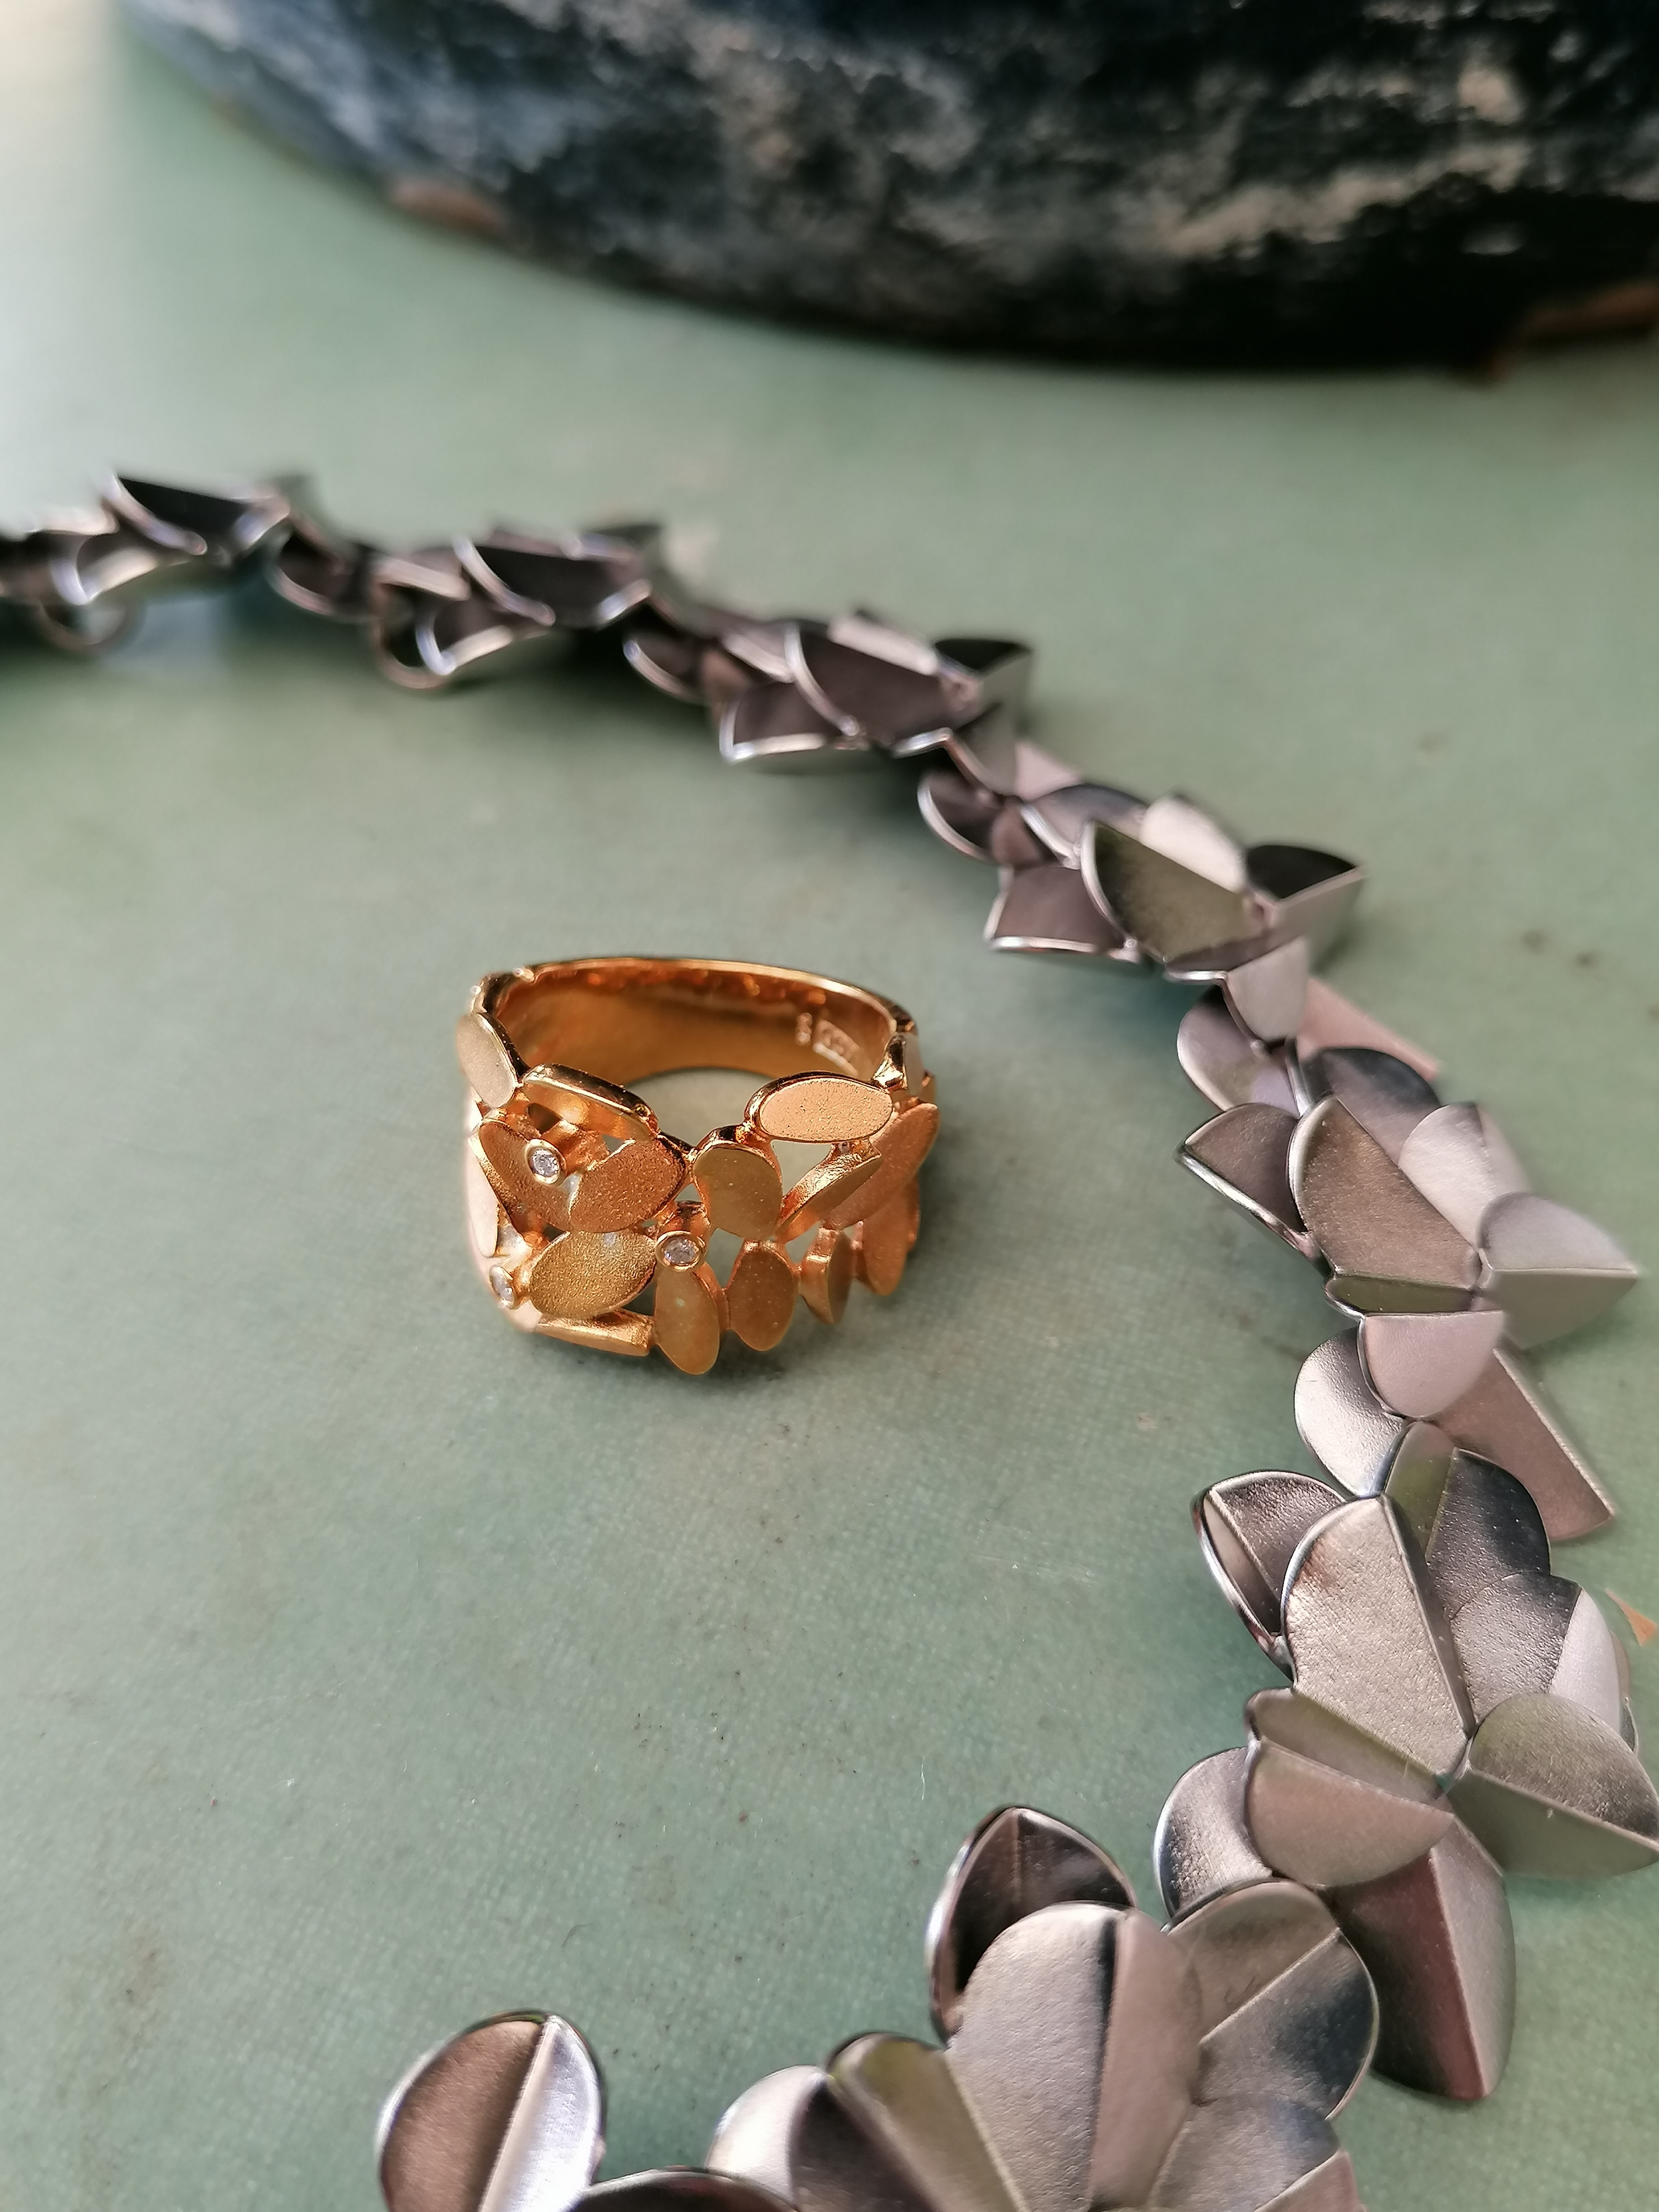 #1040 Karakoram necklace